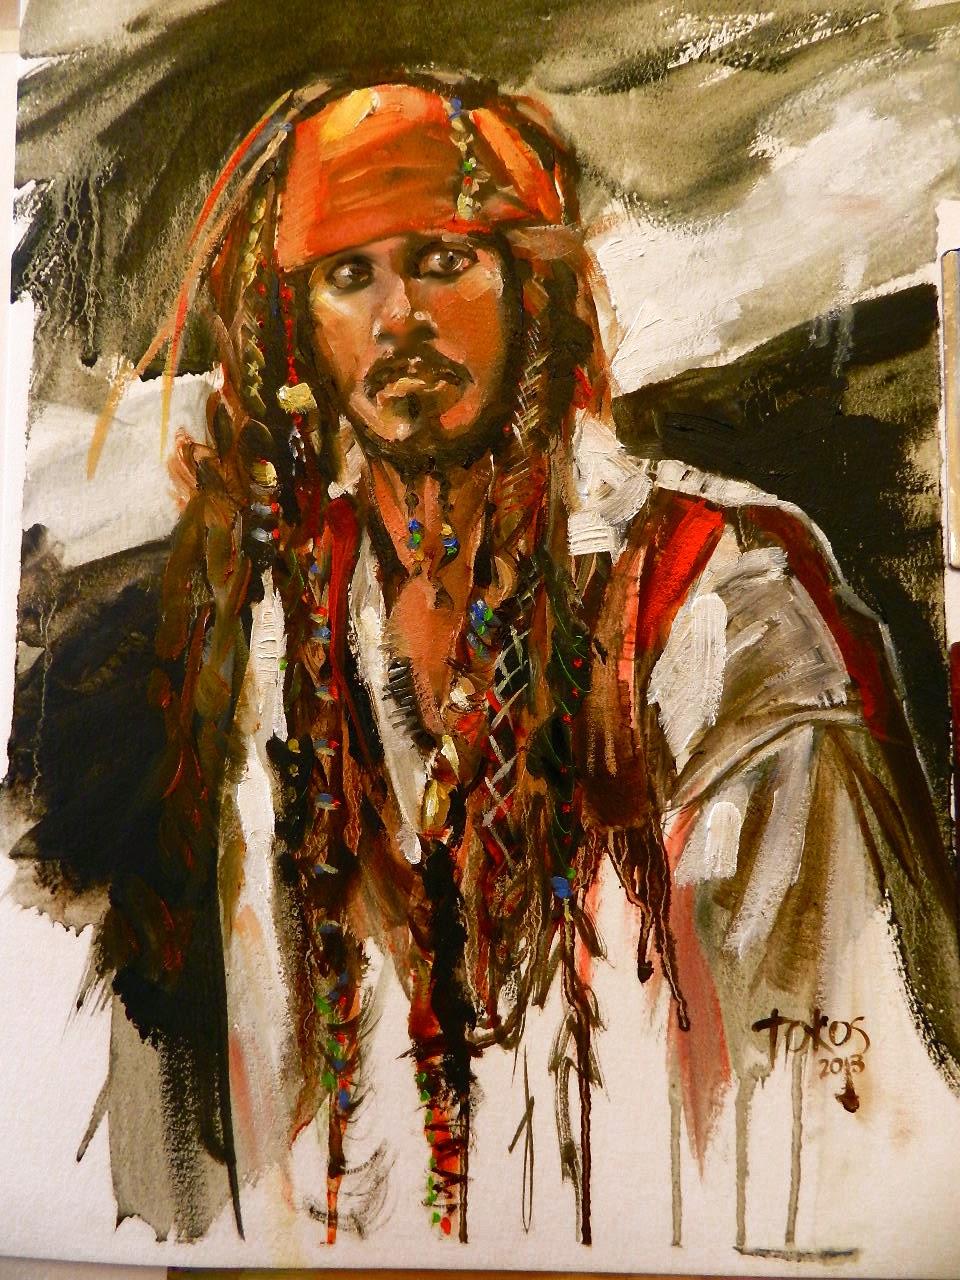 tokos fine nancy figurative paintings oil